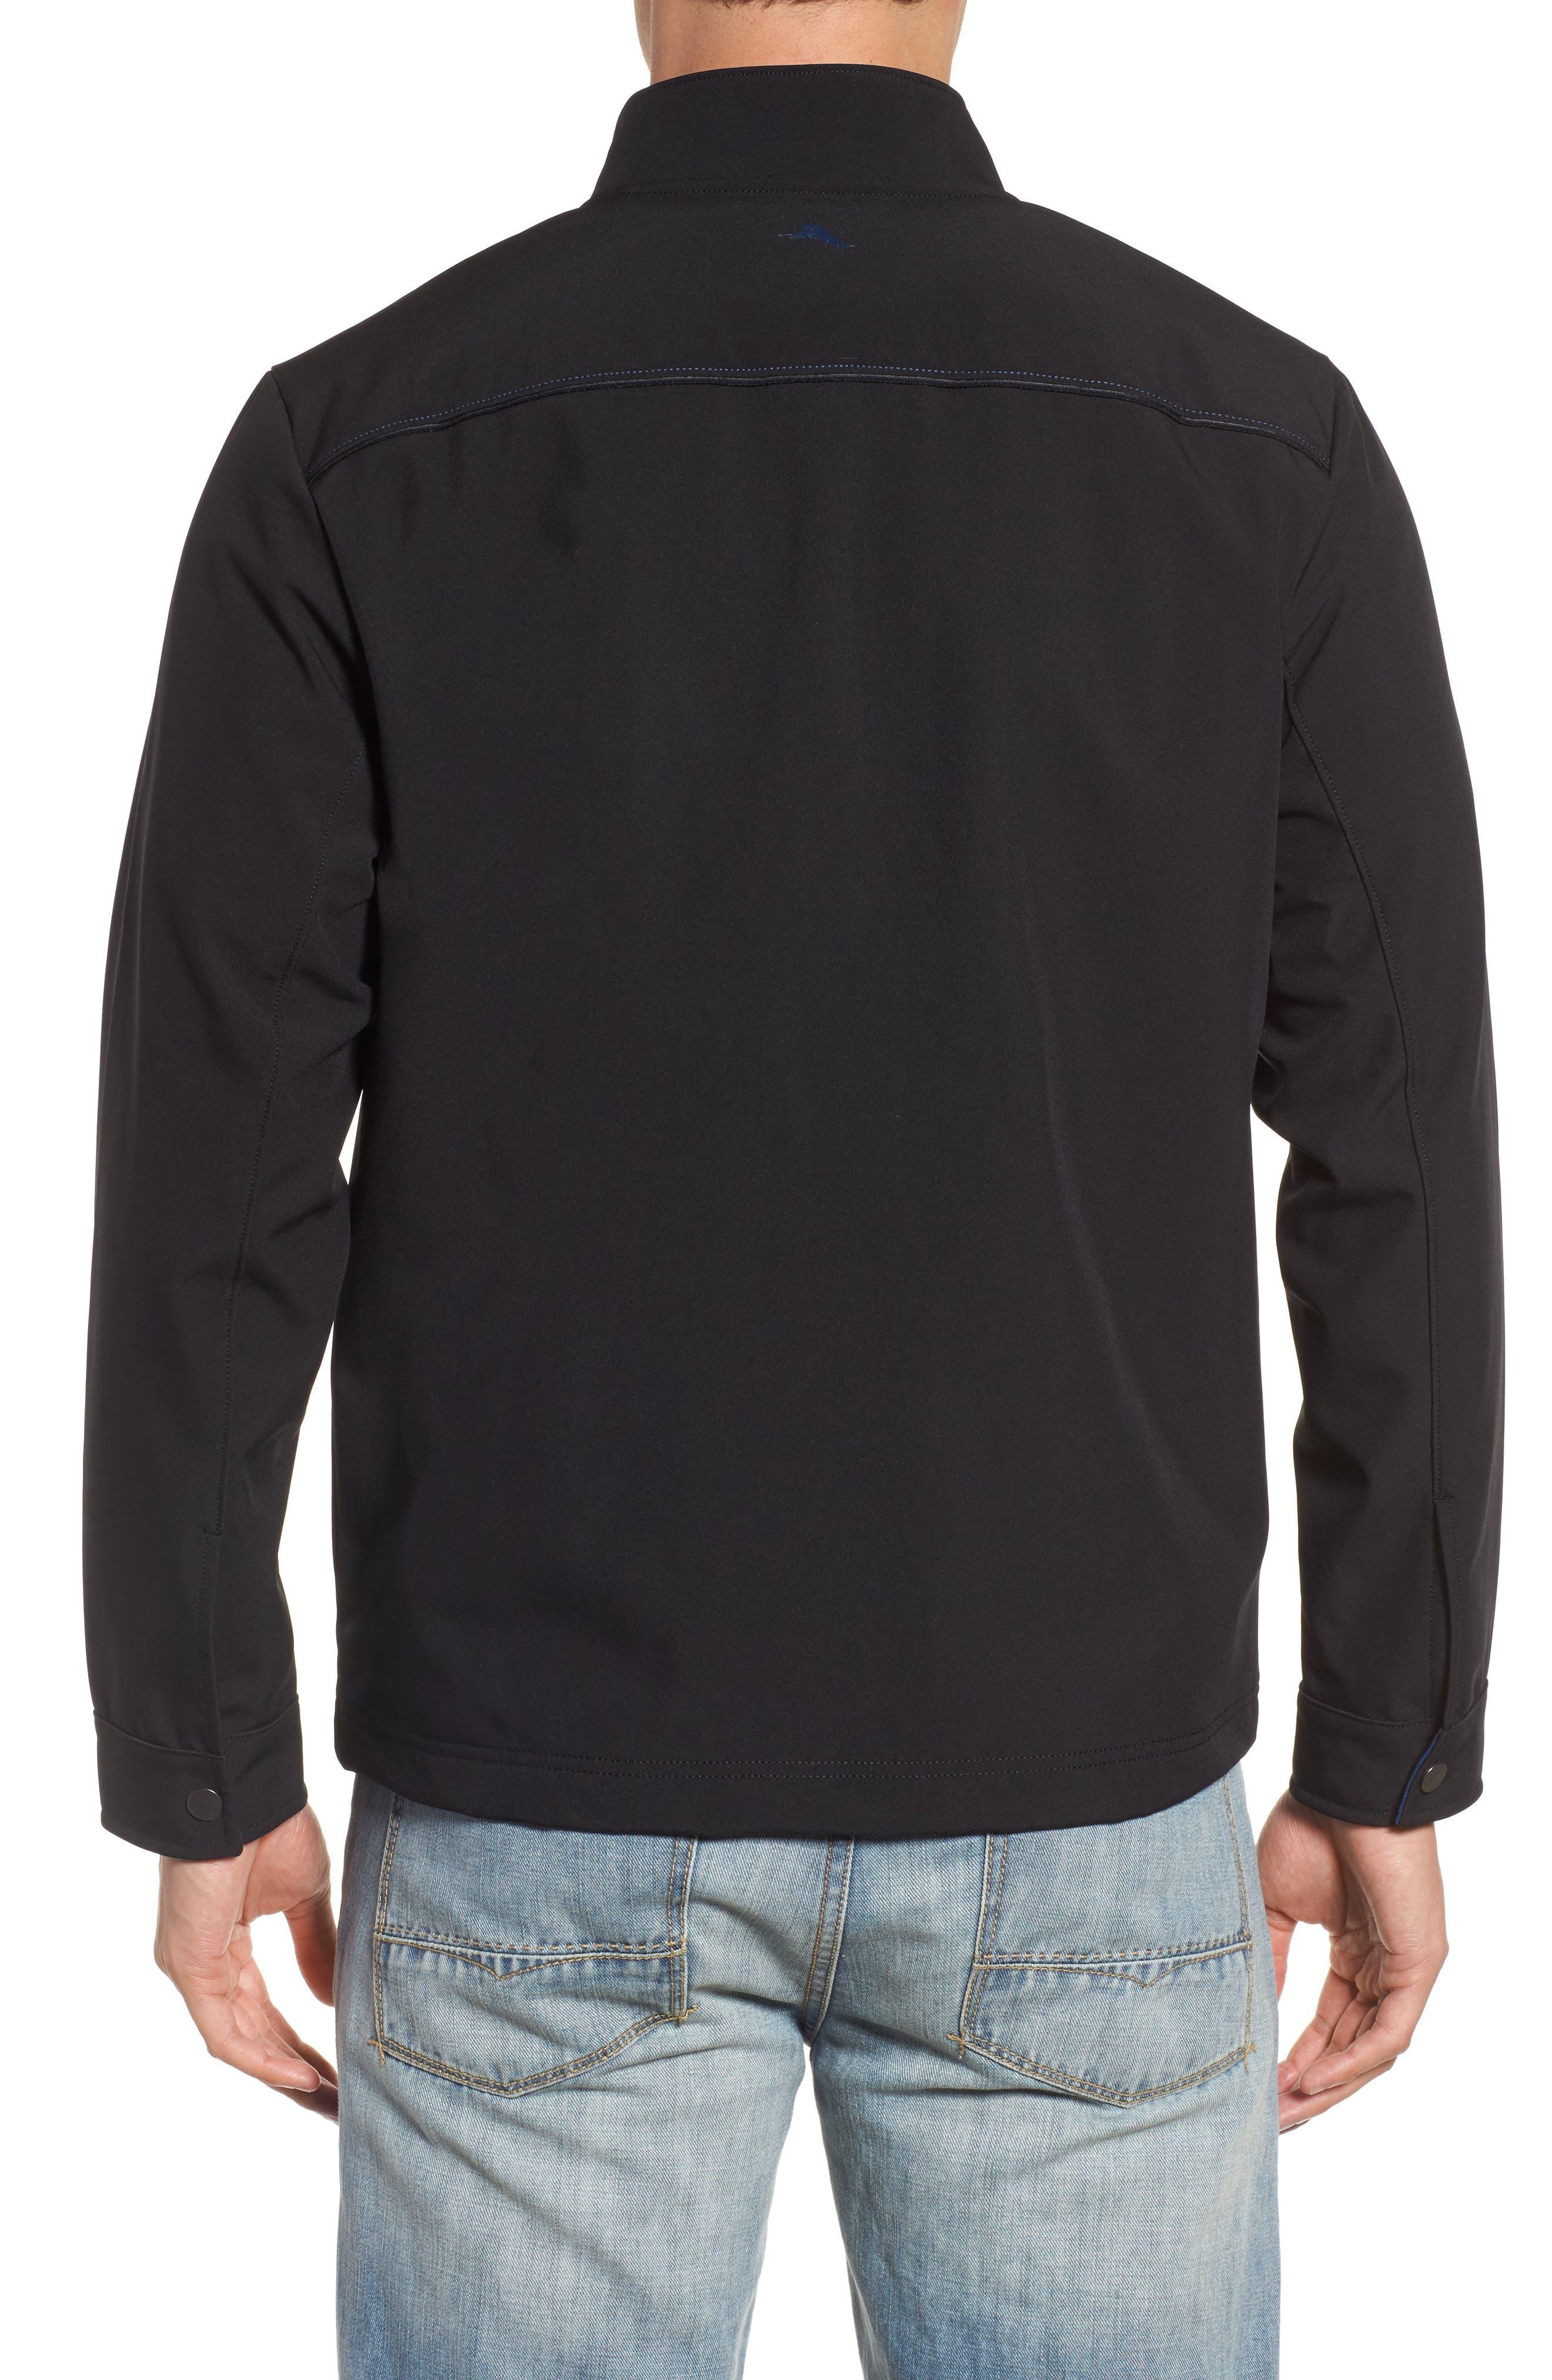 Downswing Zip Jacket,                             Alternate thumbnail 2, color,                             001